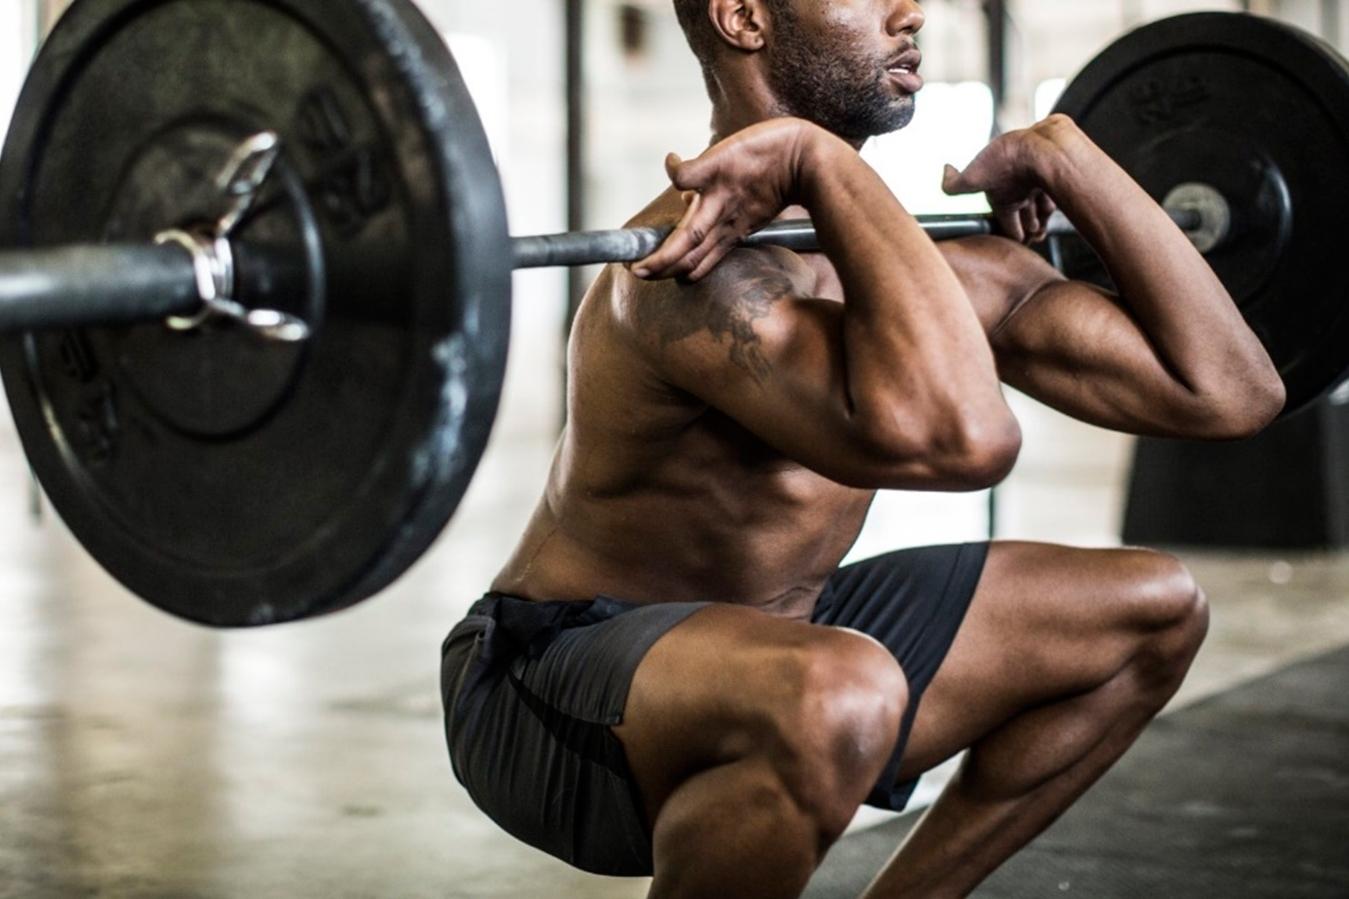 ¿No consigues ganar masa muscular? 12 errores típicos